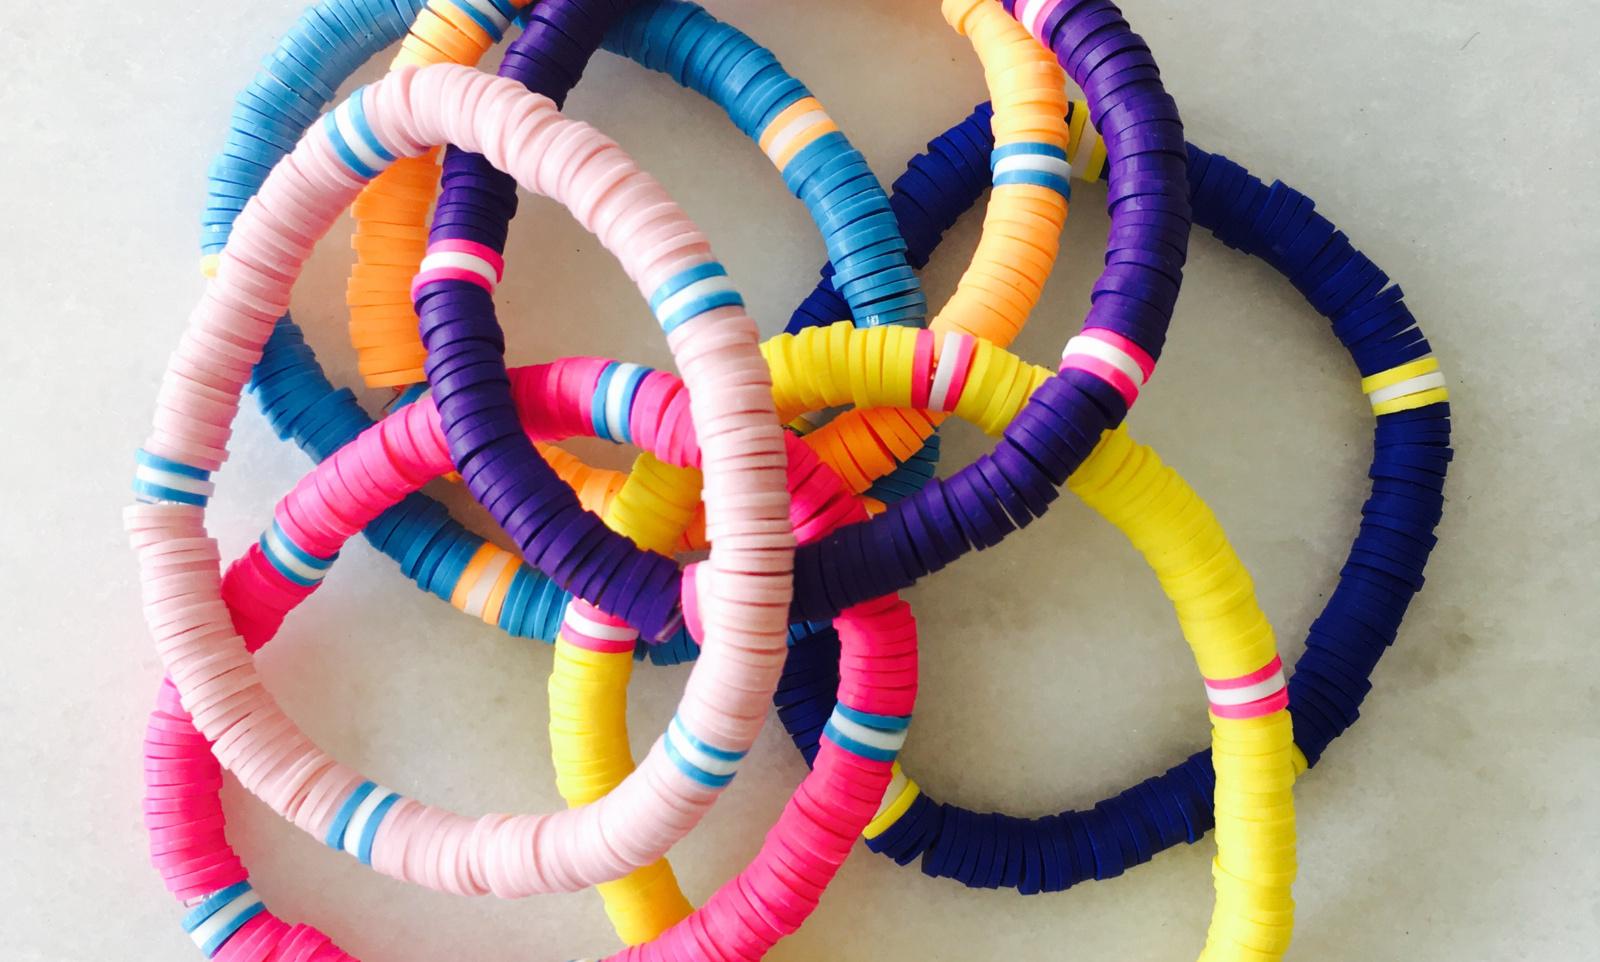 Surfbracelets